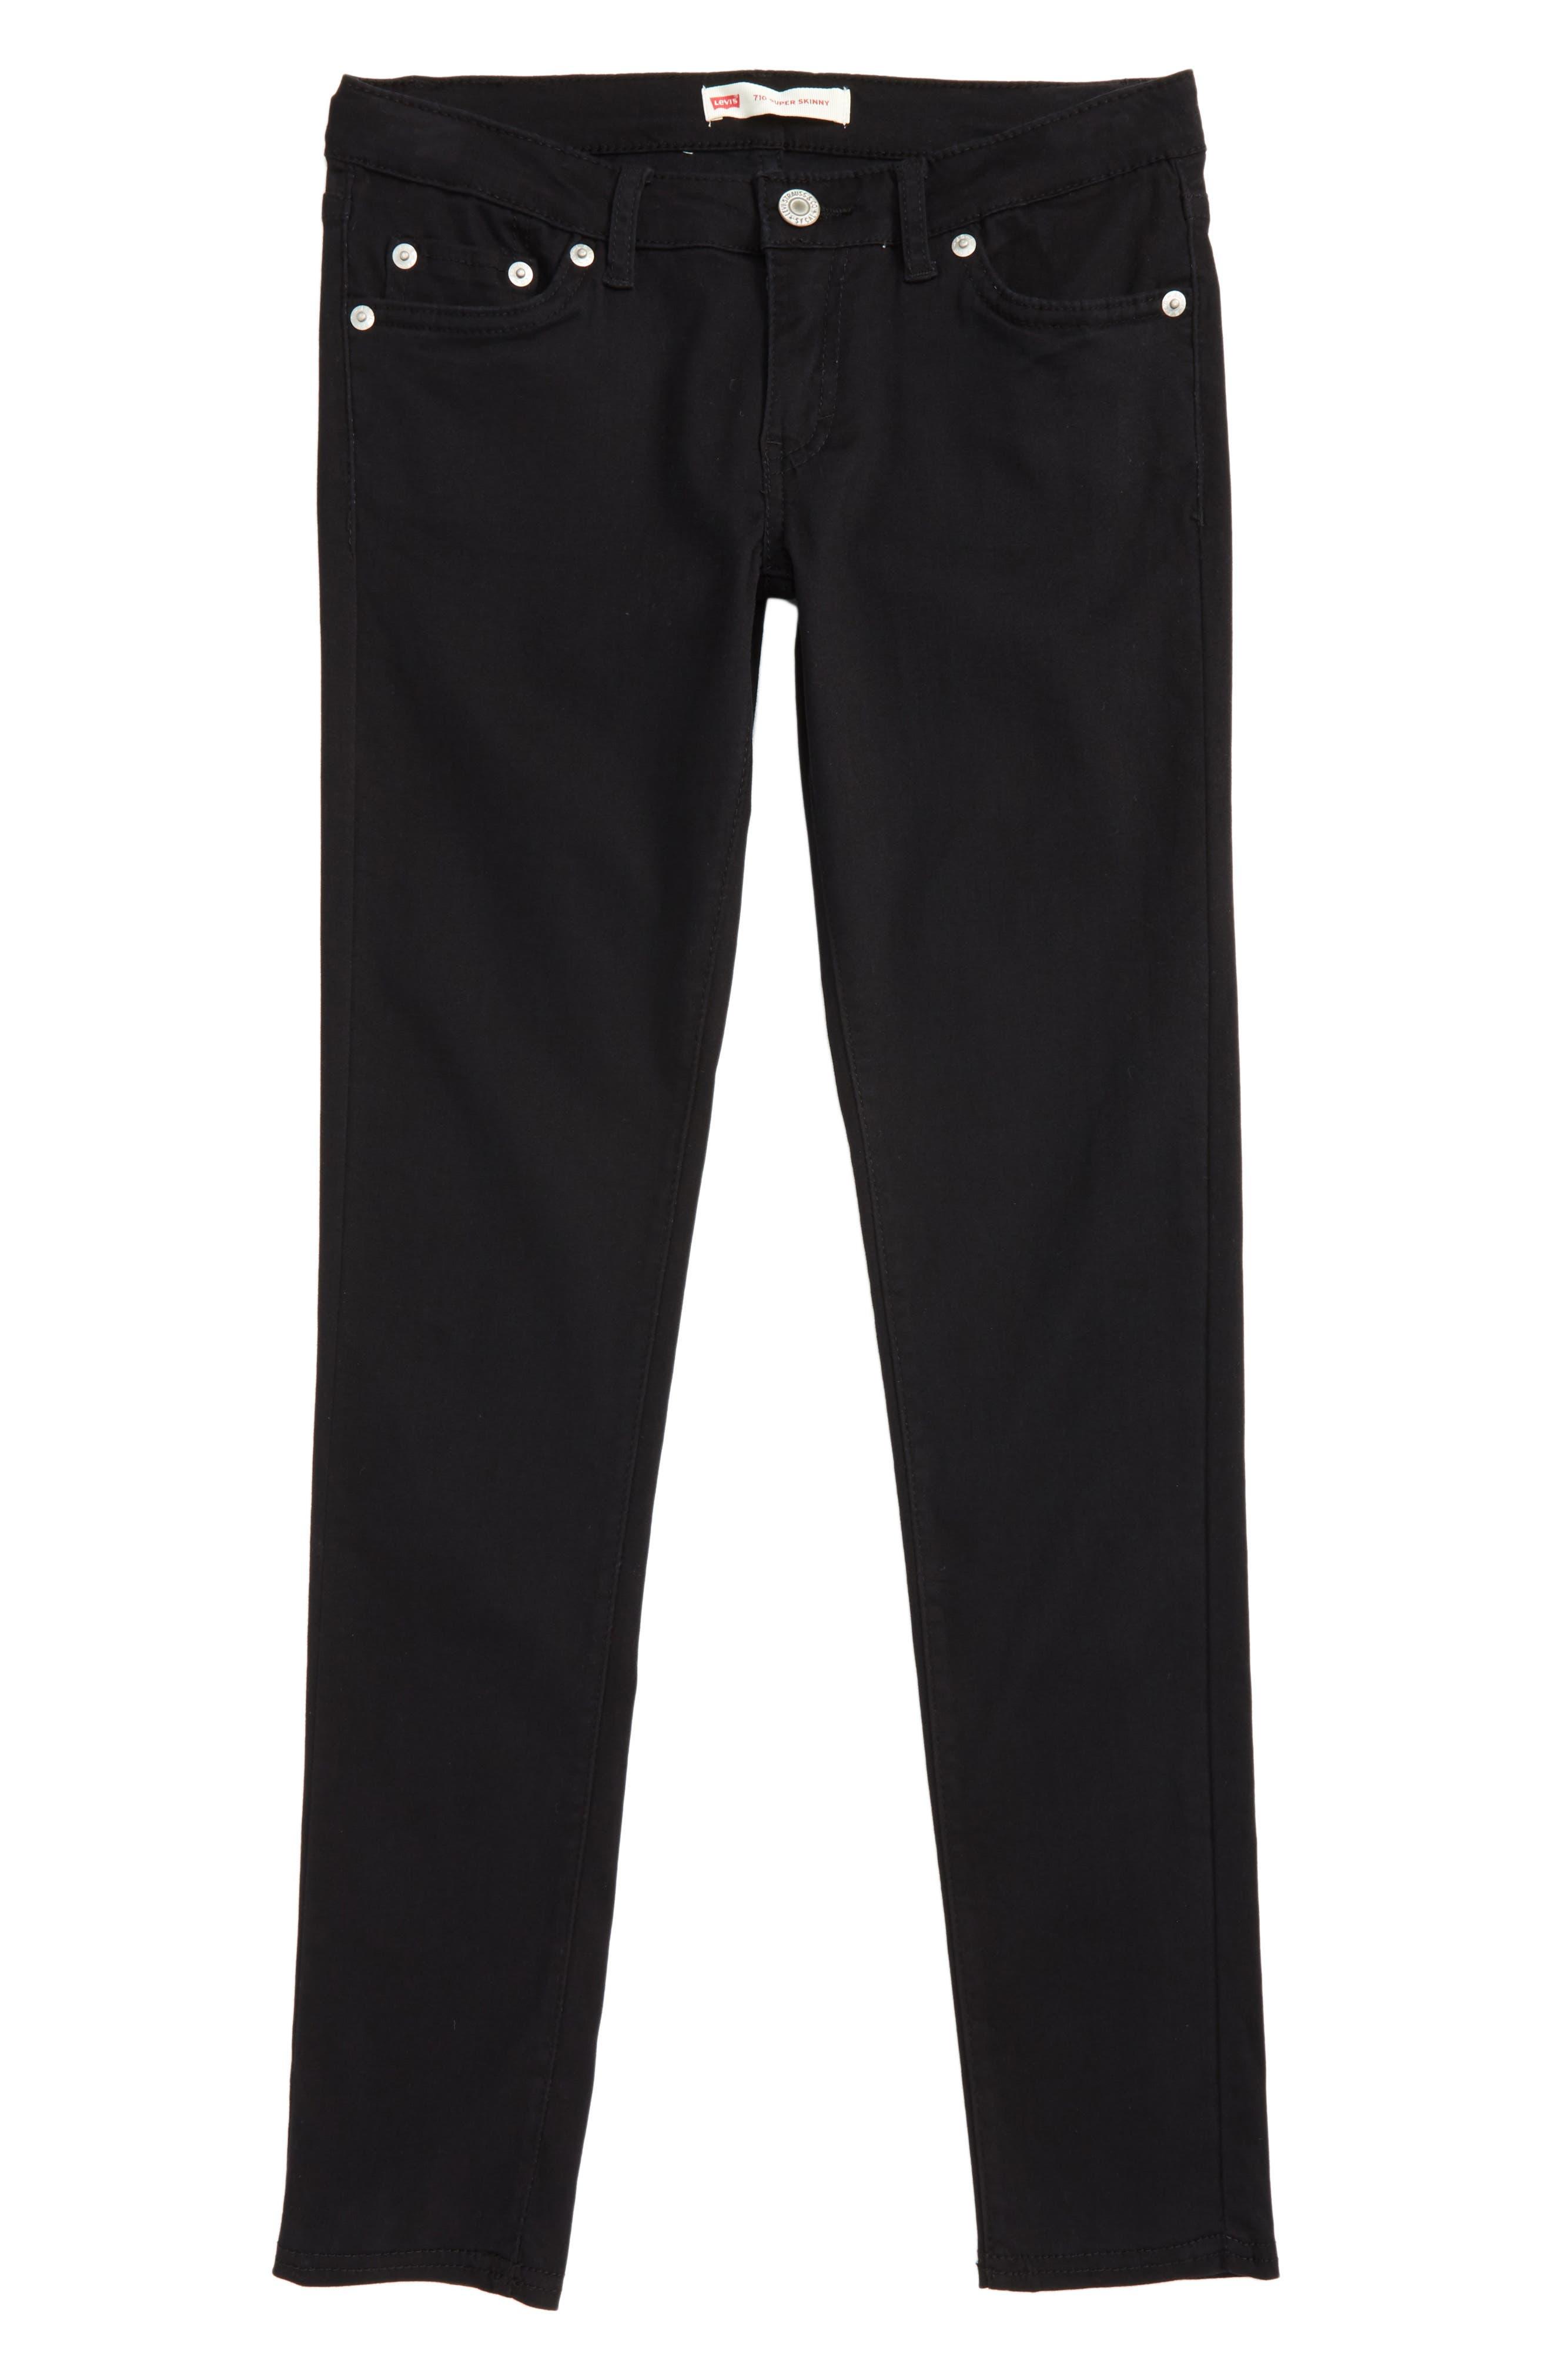 Main Image - Levi's® 710™ Super Skinny Stretch Jeans (Big Girls)